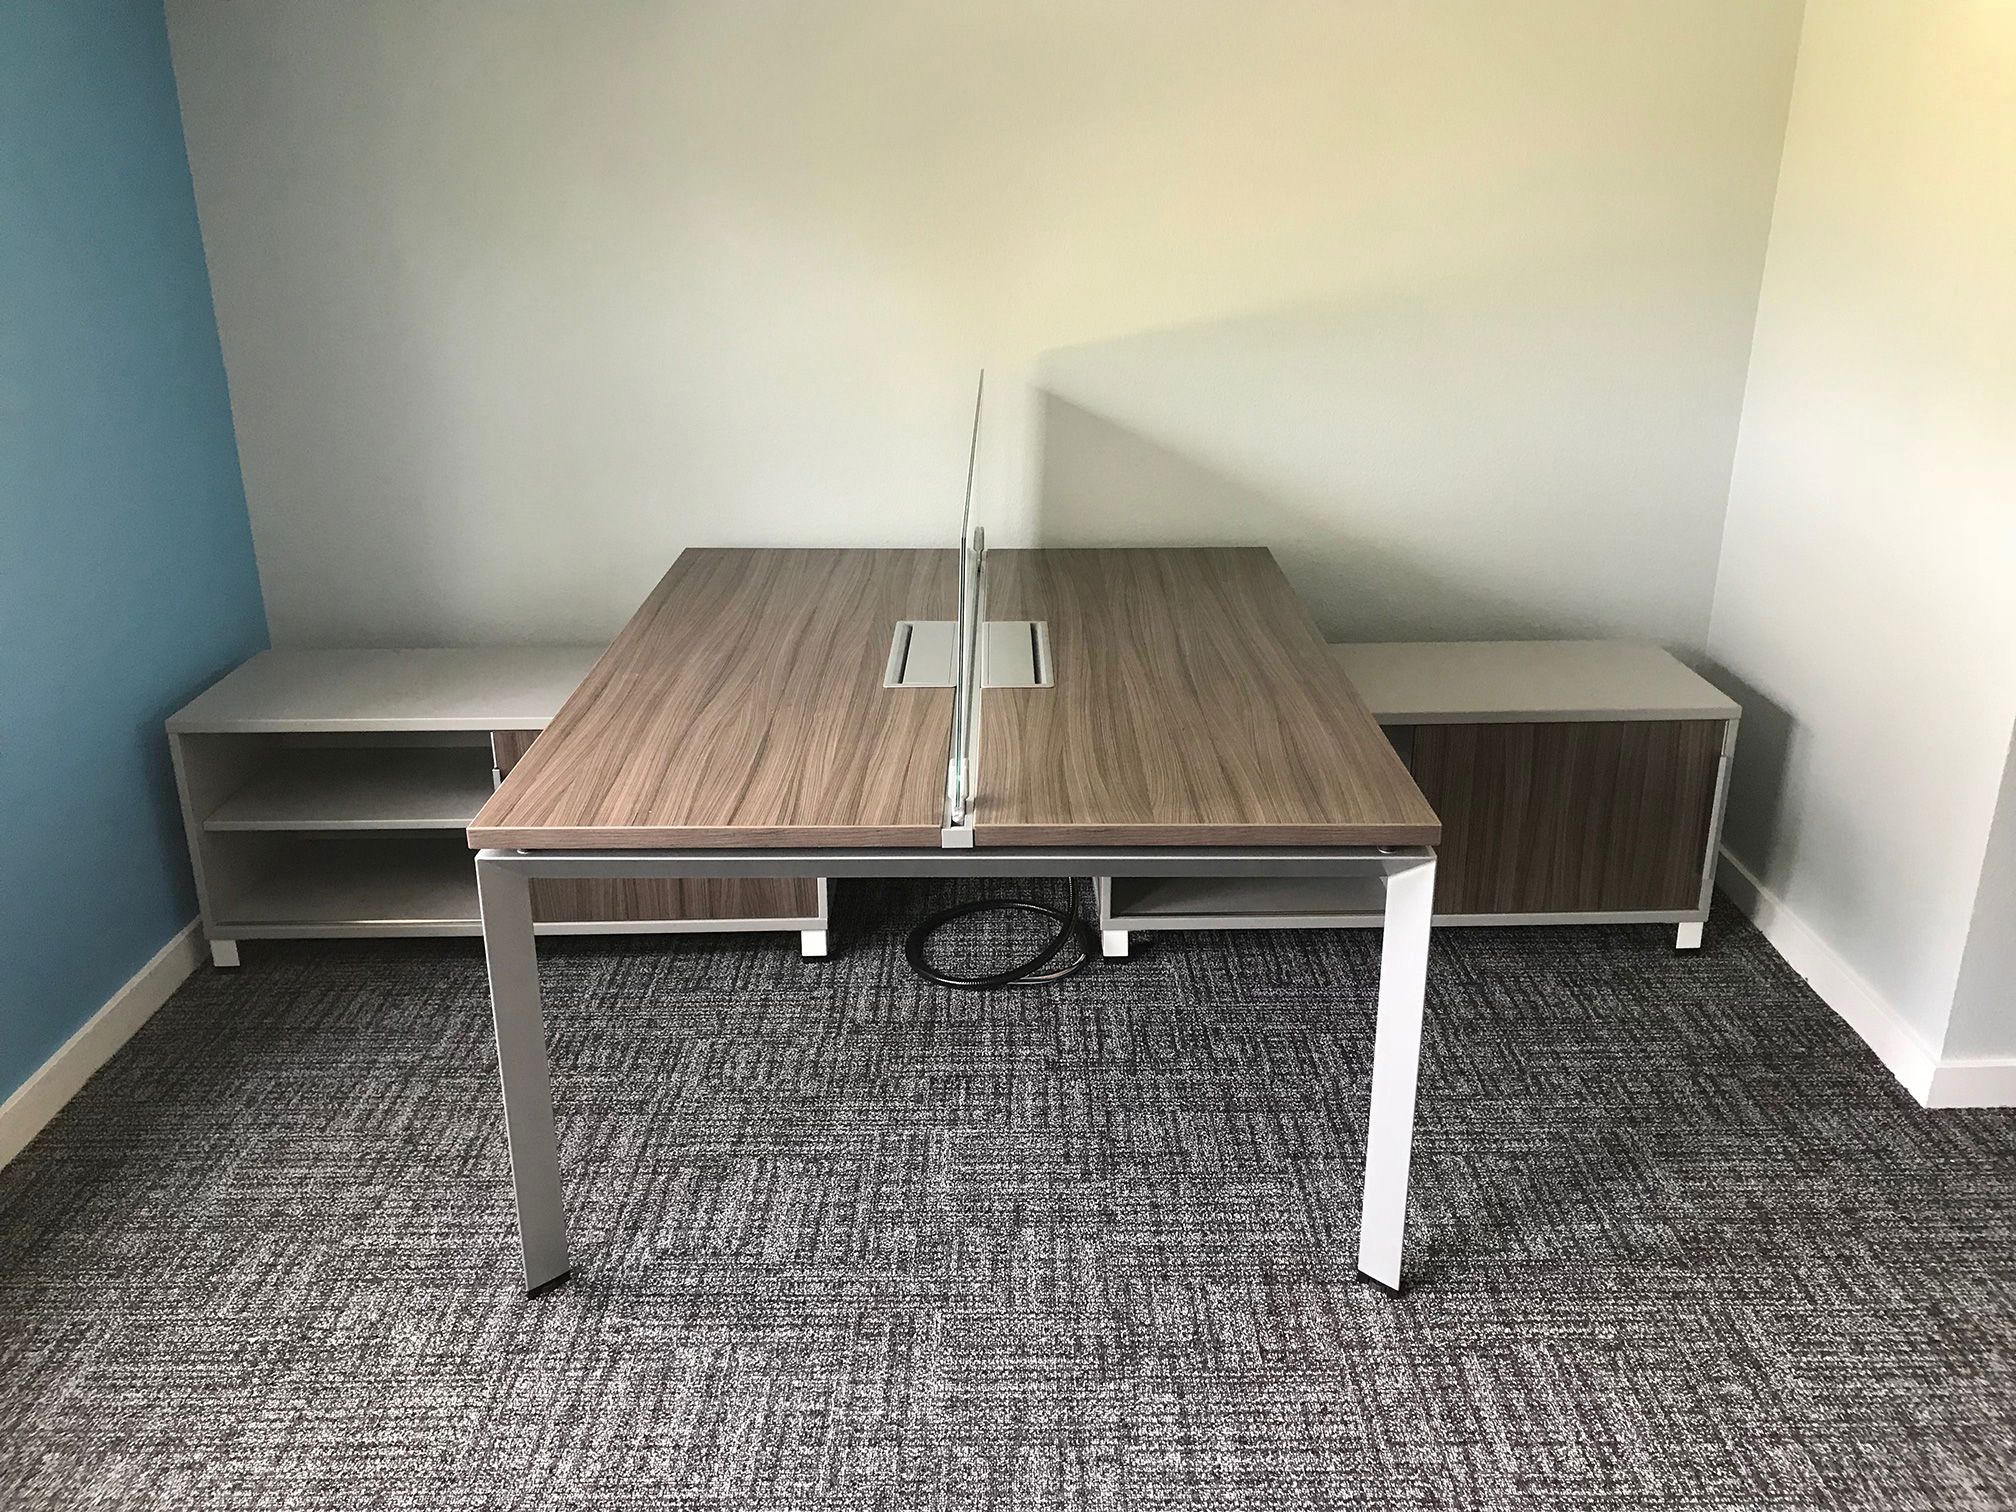 furniture-cubicles-in-naples-florida-5.jpg